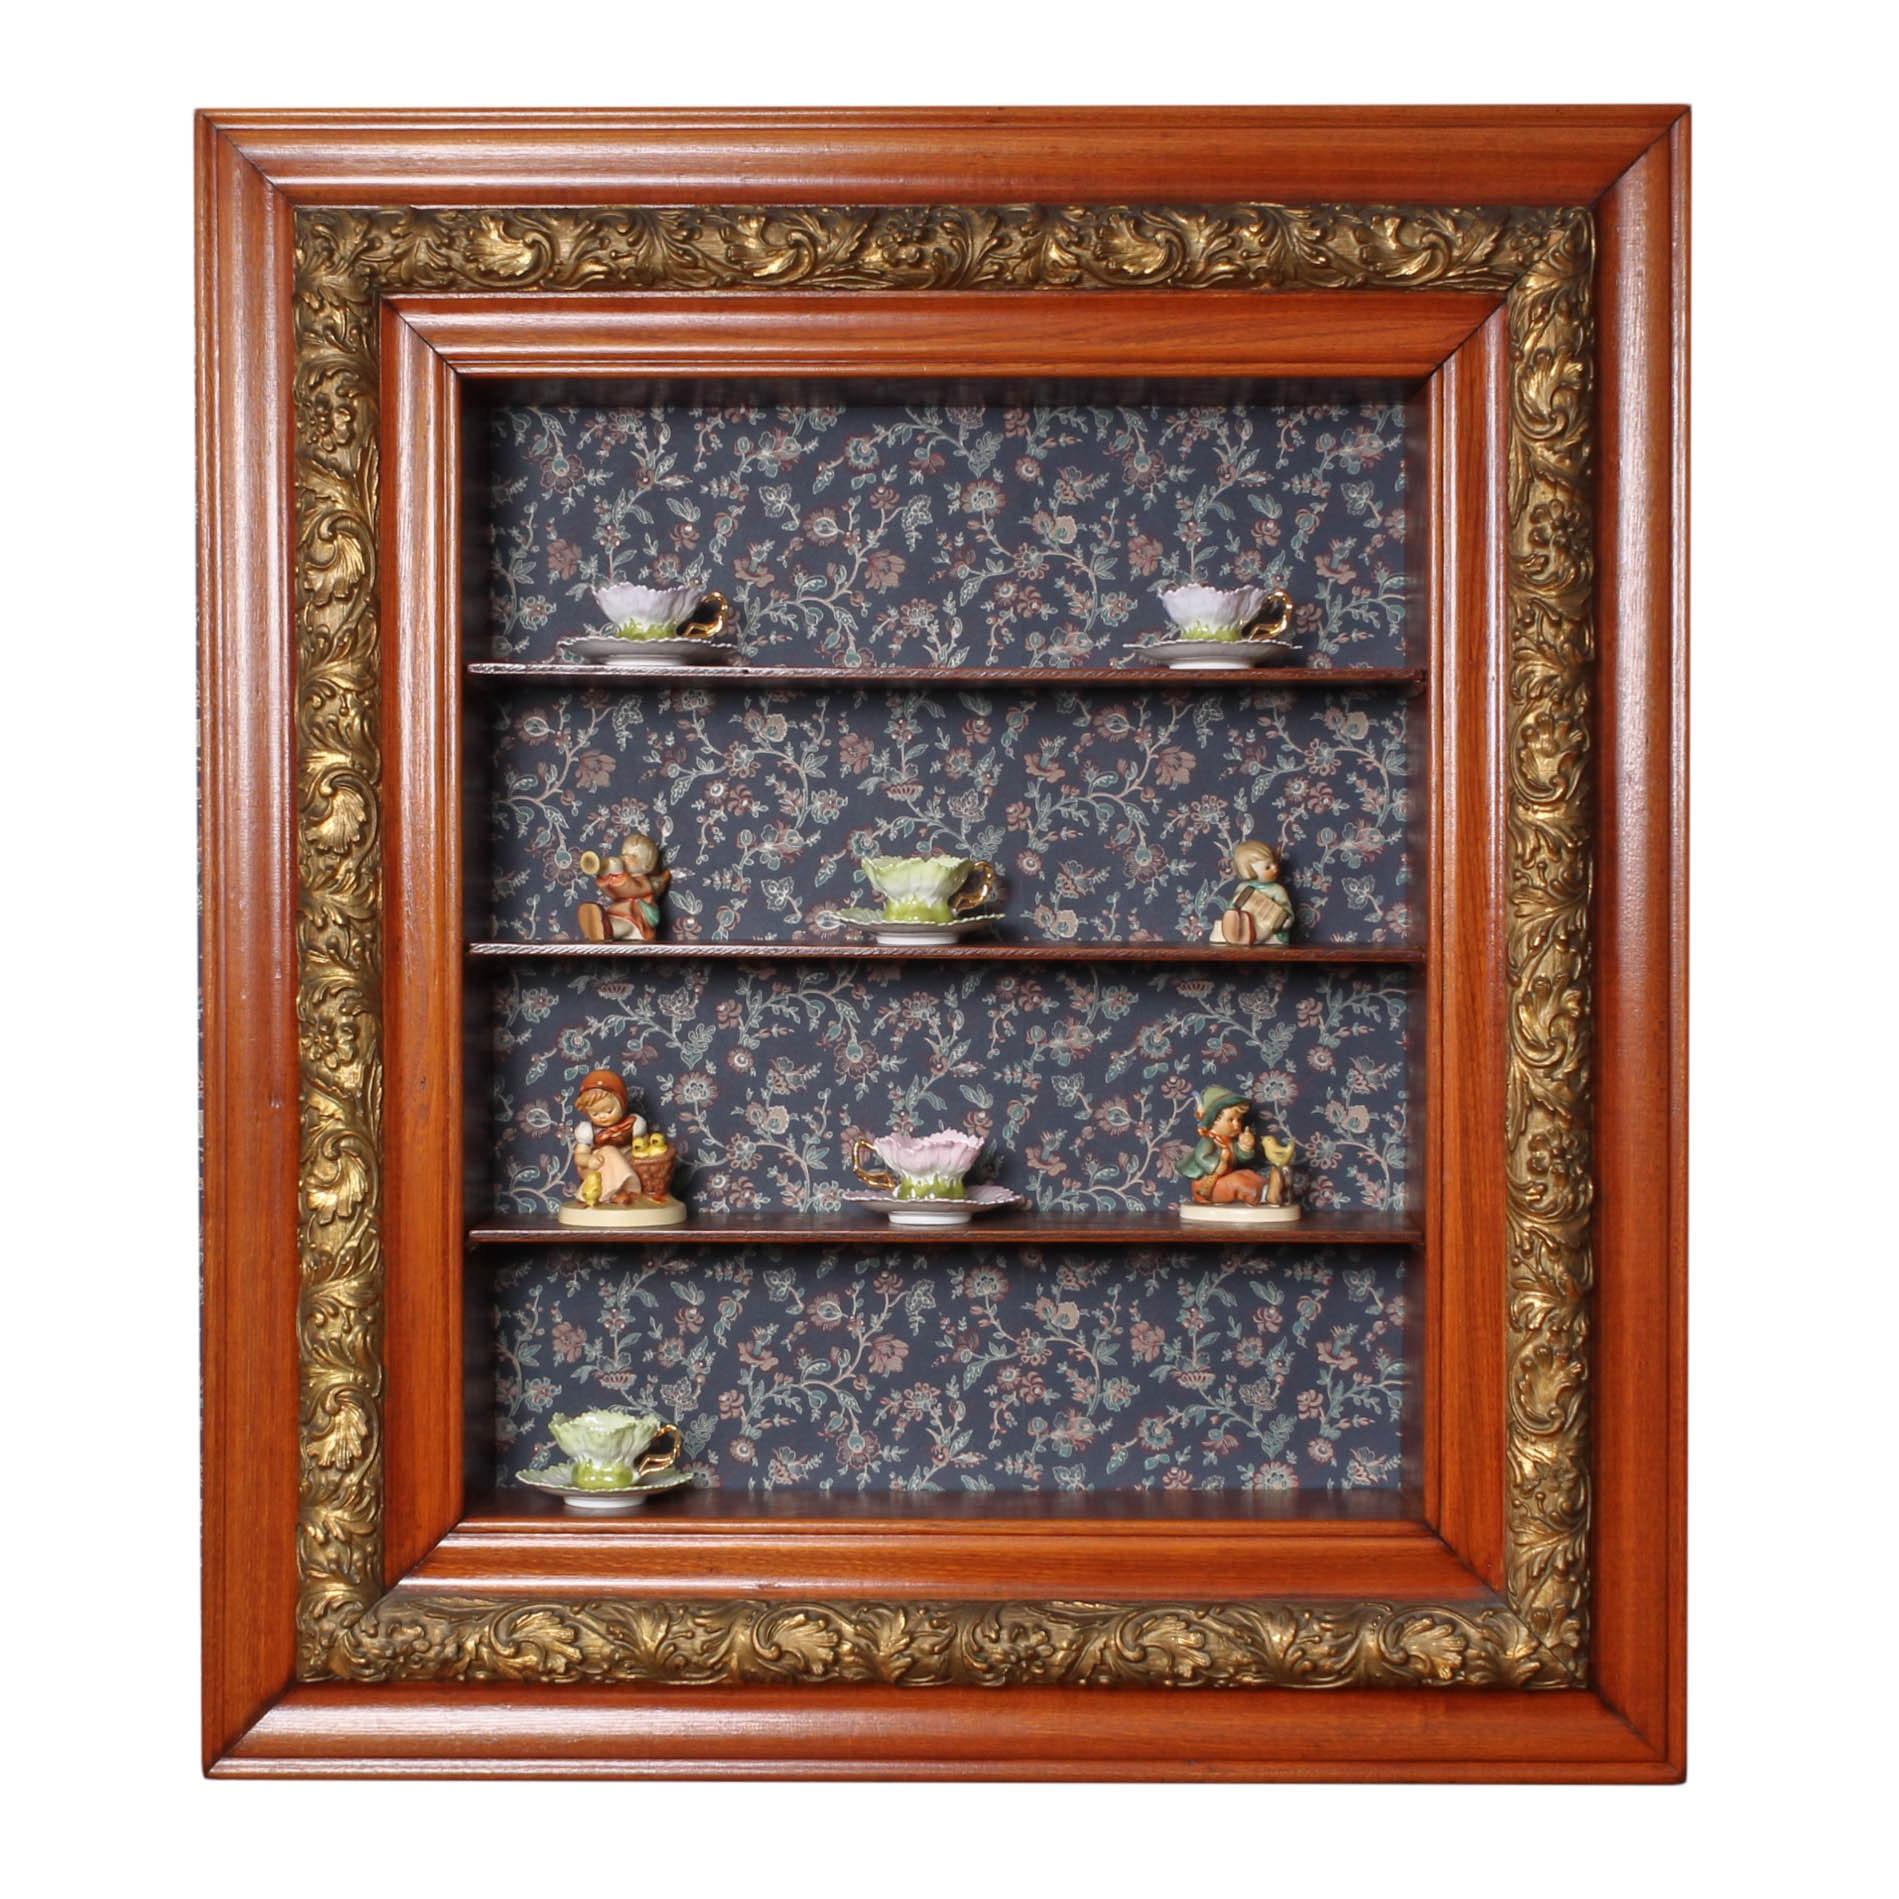 Gilt Wood Display Shelf with Hummel Figurines